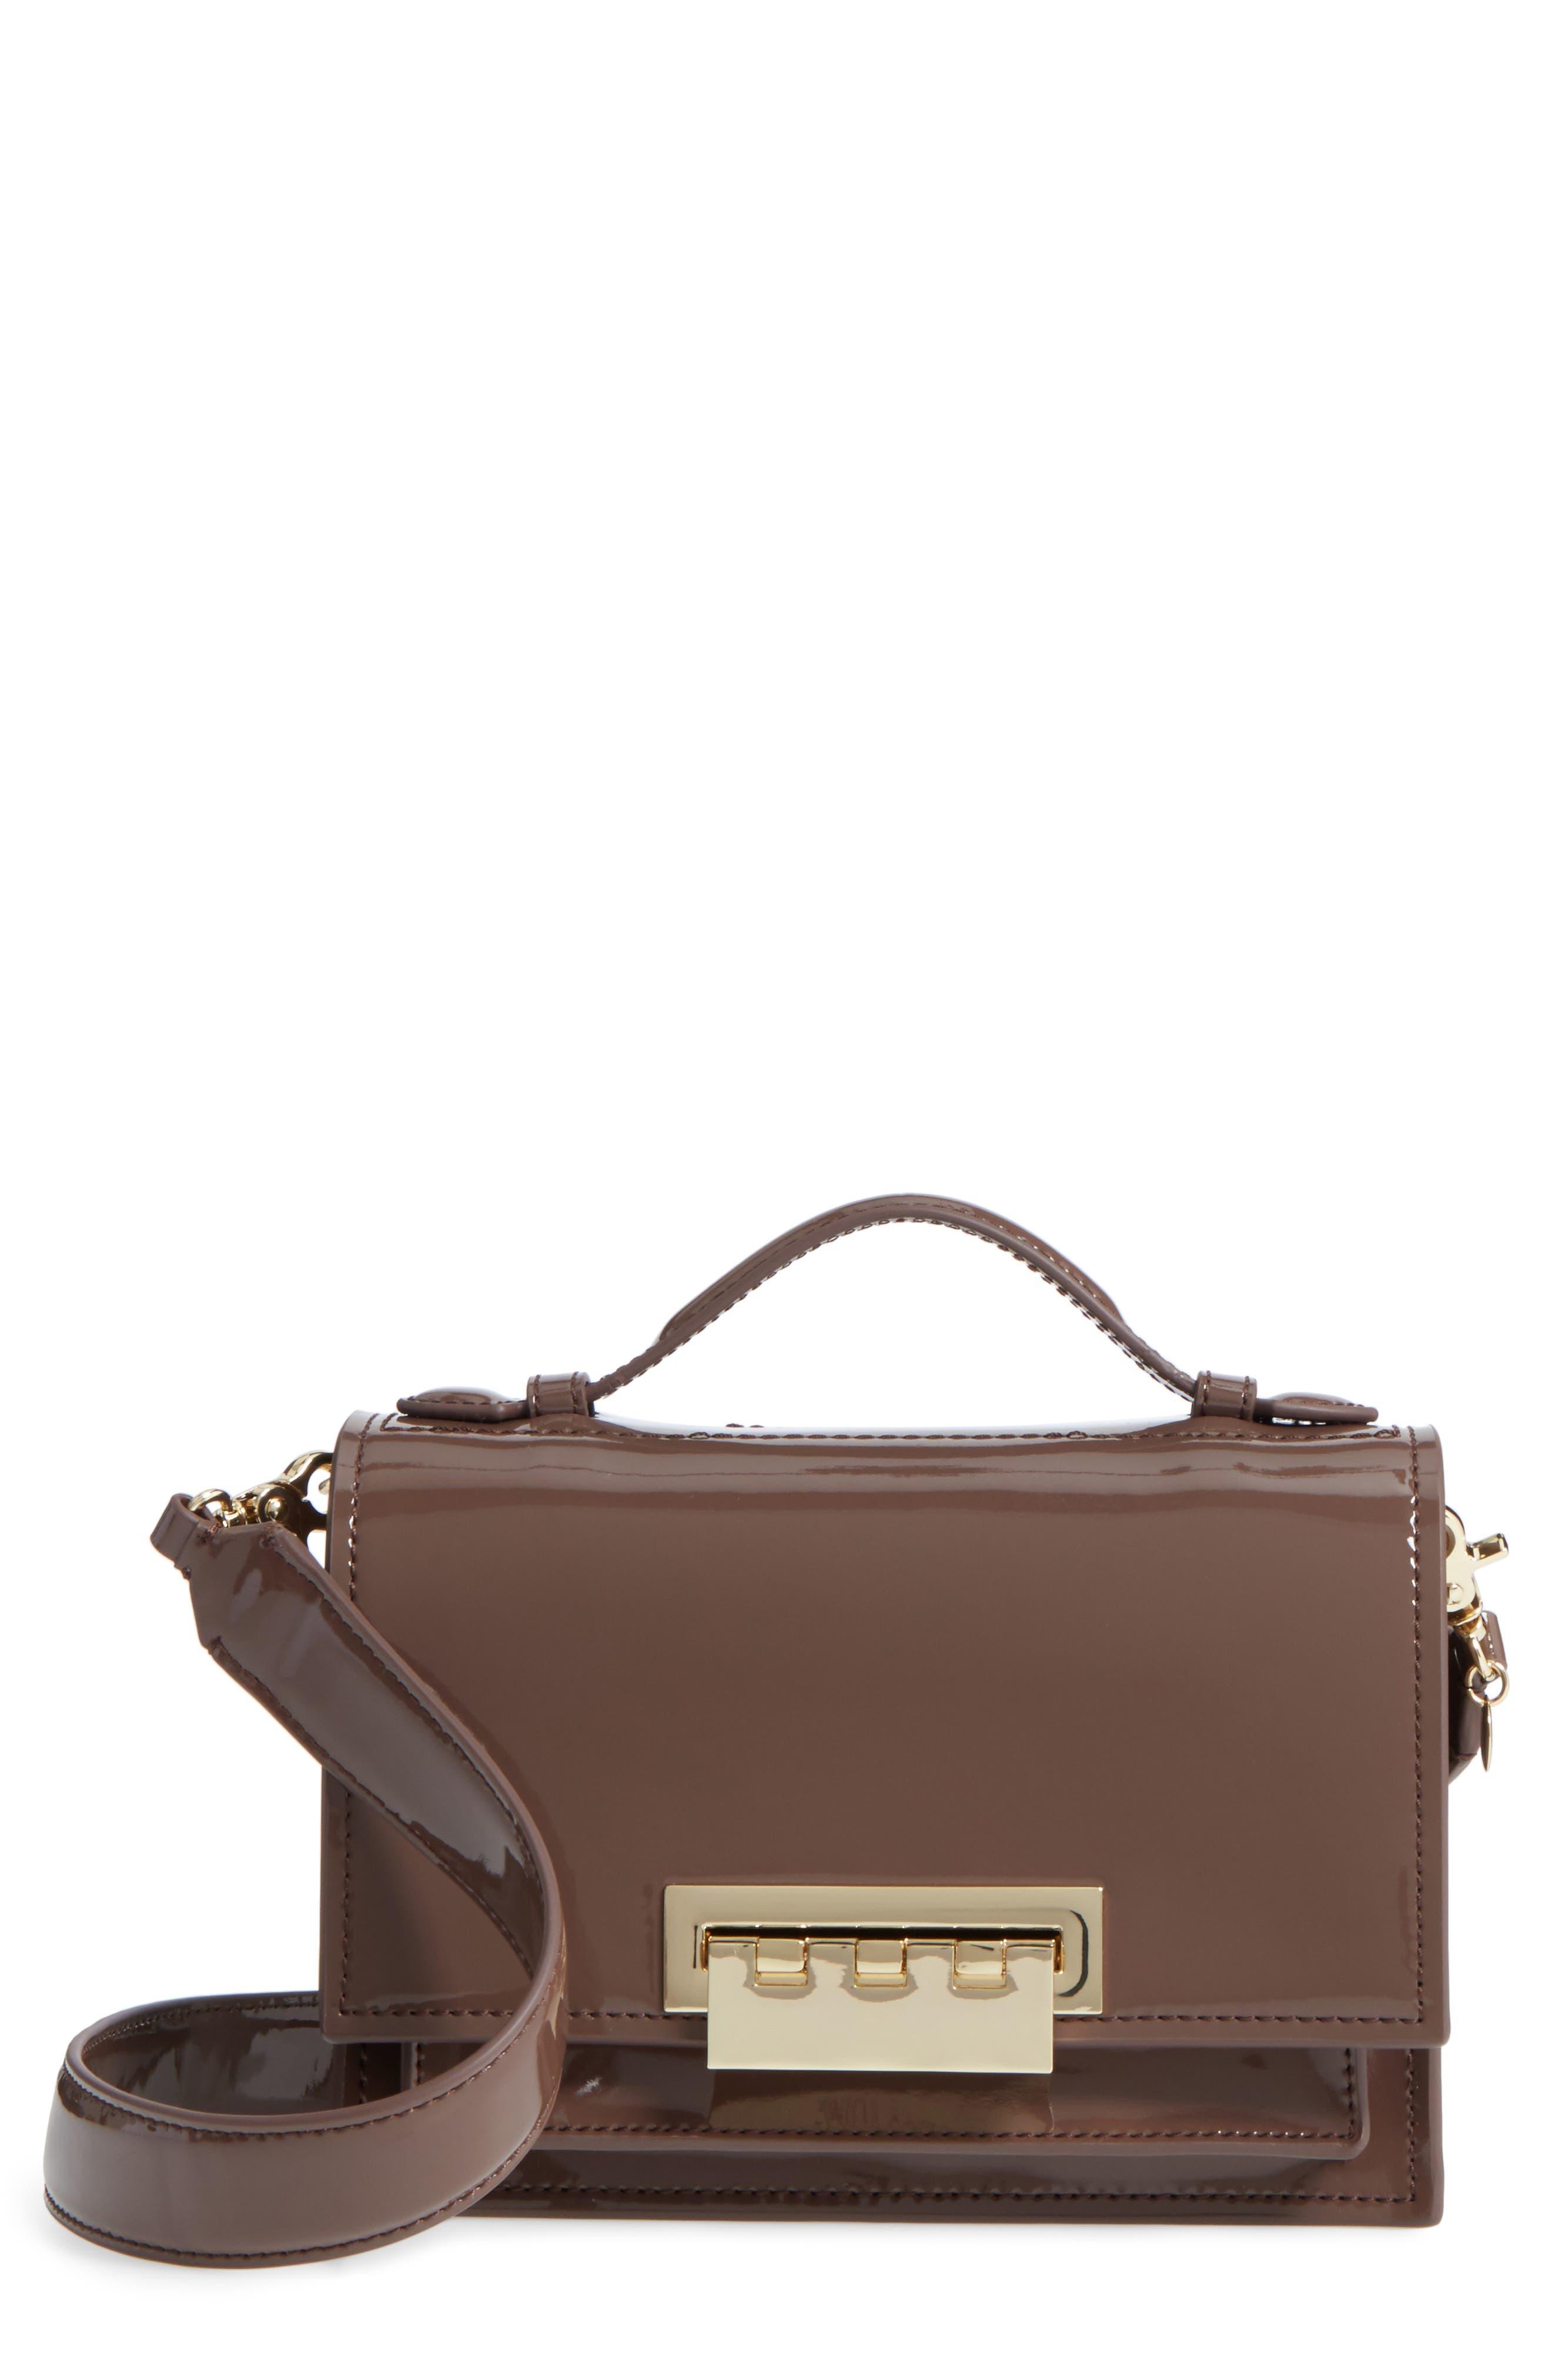 Earthette Patent Leather Accordion Bag,                         Main,                         color, 202